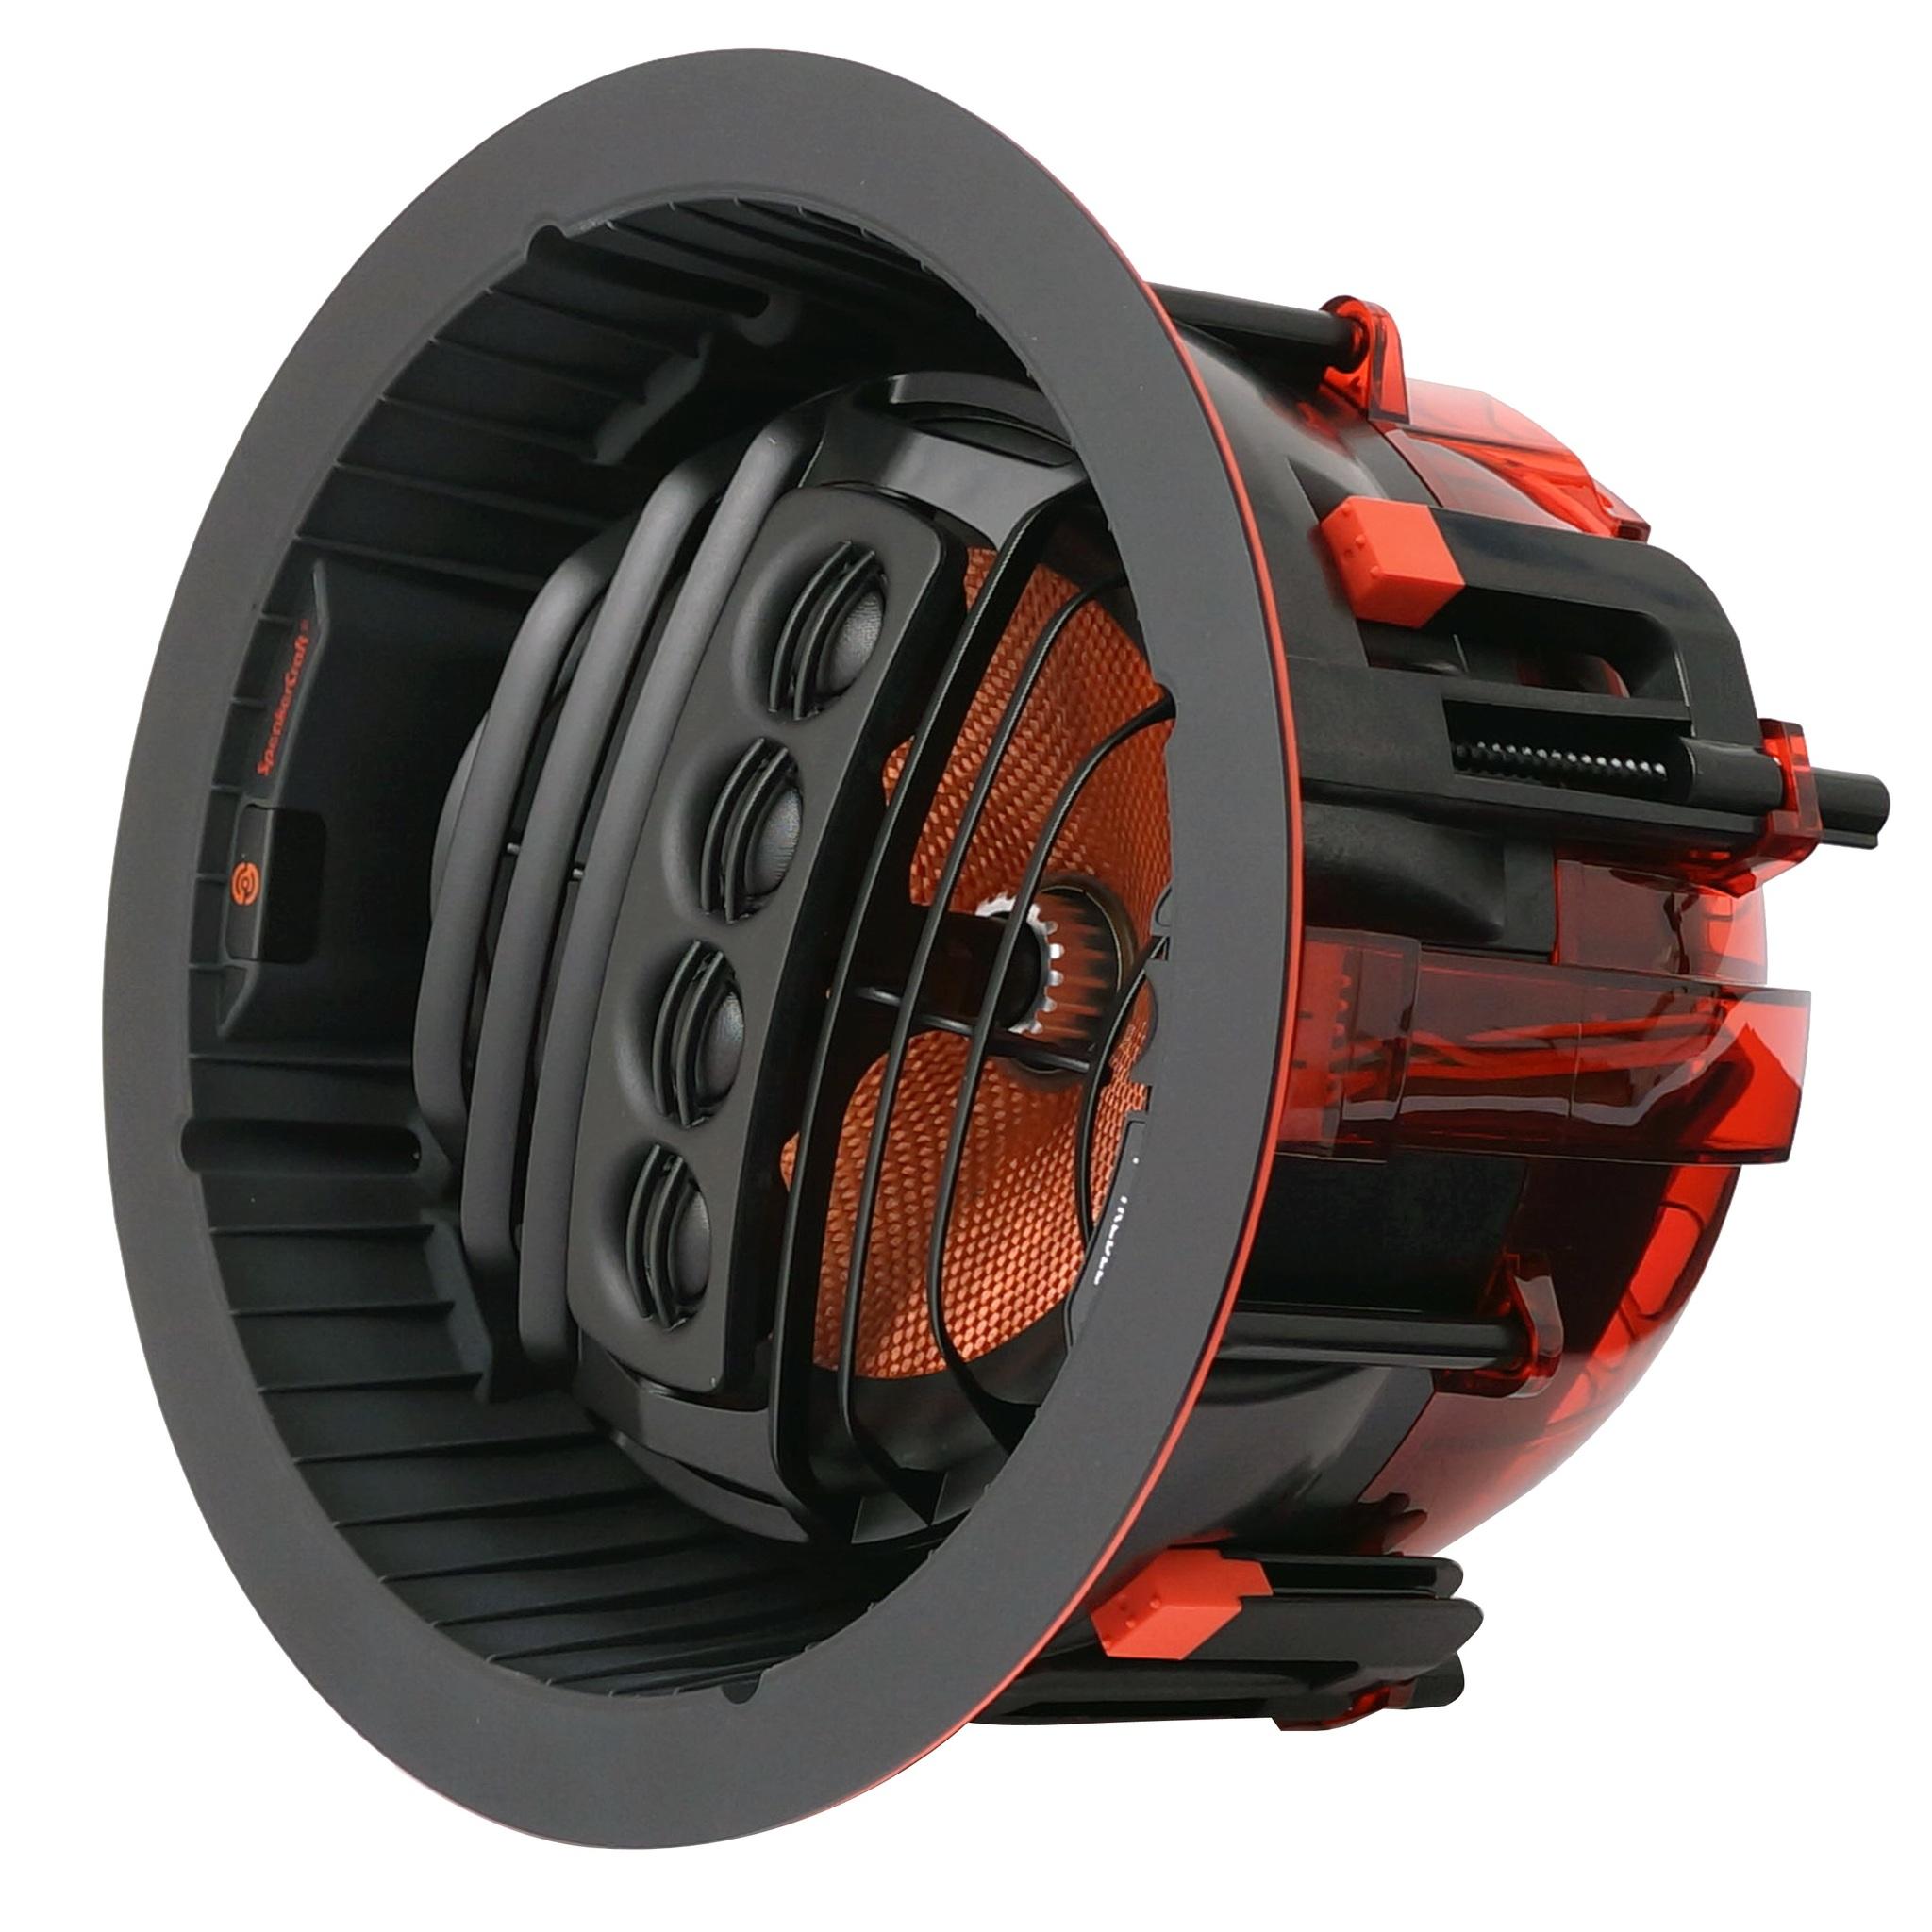 SpeakerCraft AIM7 Two Series